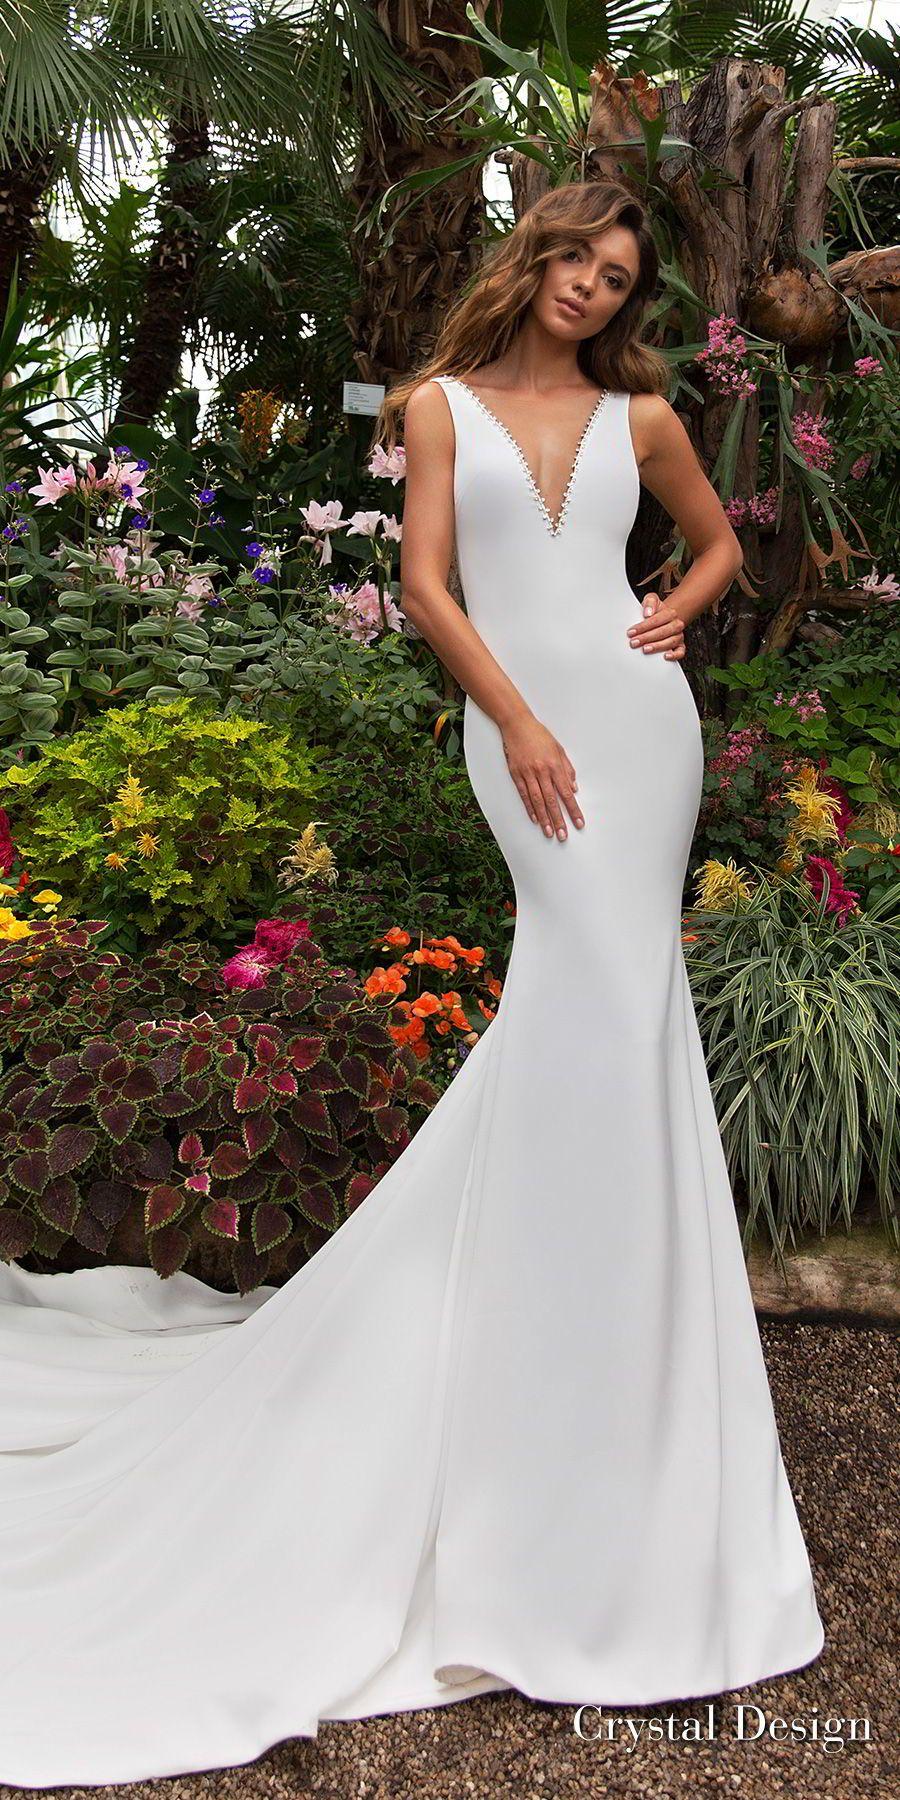 Corona borealis wedding dresses gelinlik pinterest